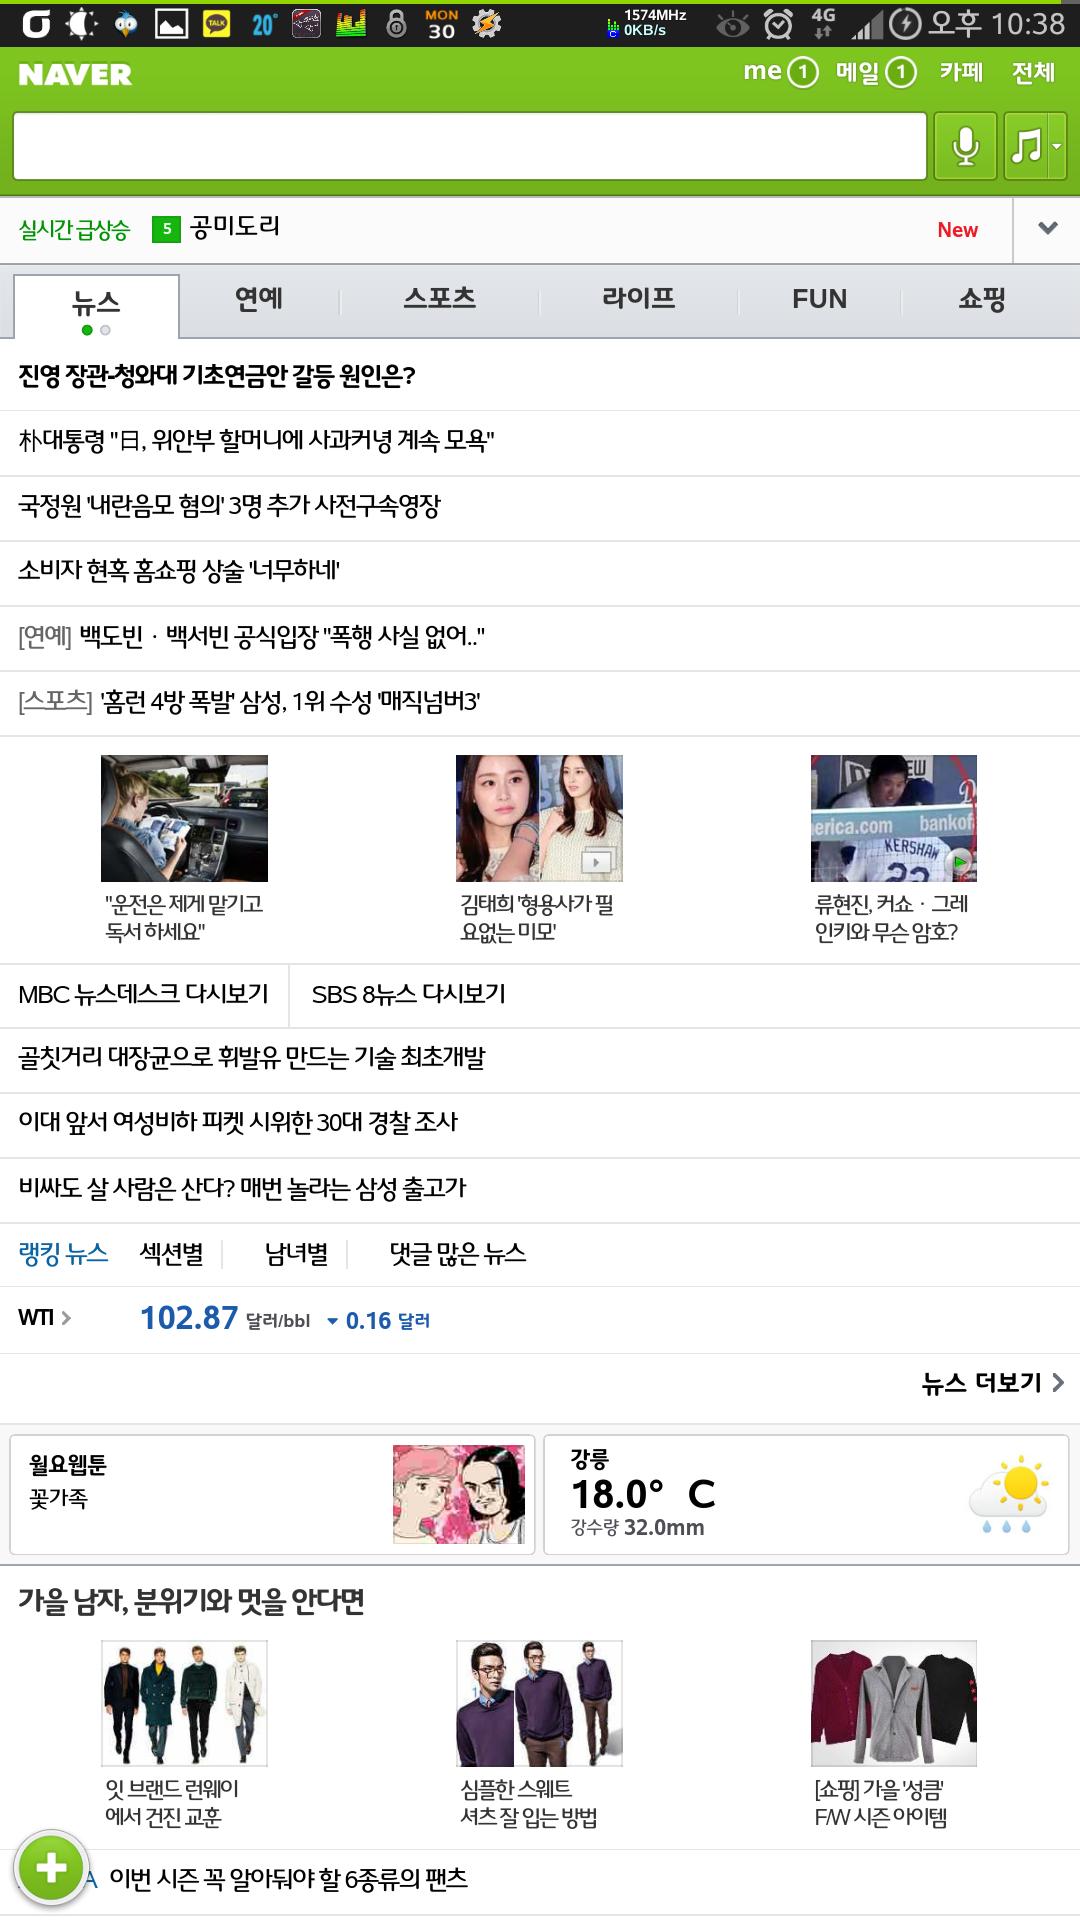 Screenshot_2013-09-30-22-38-35.png